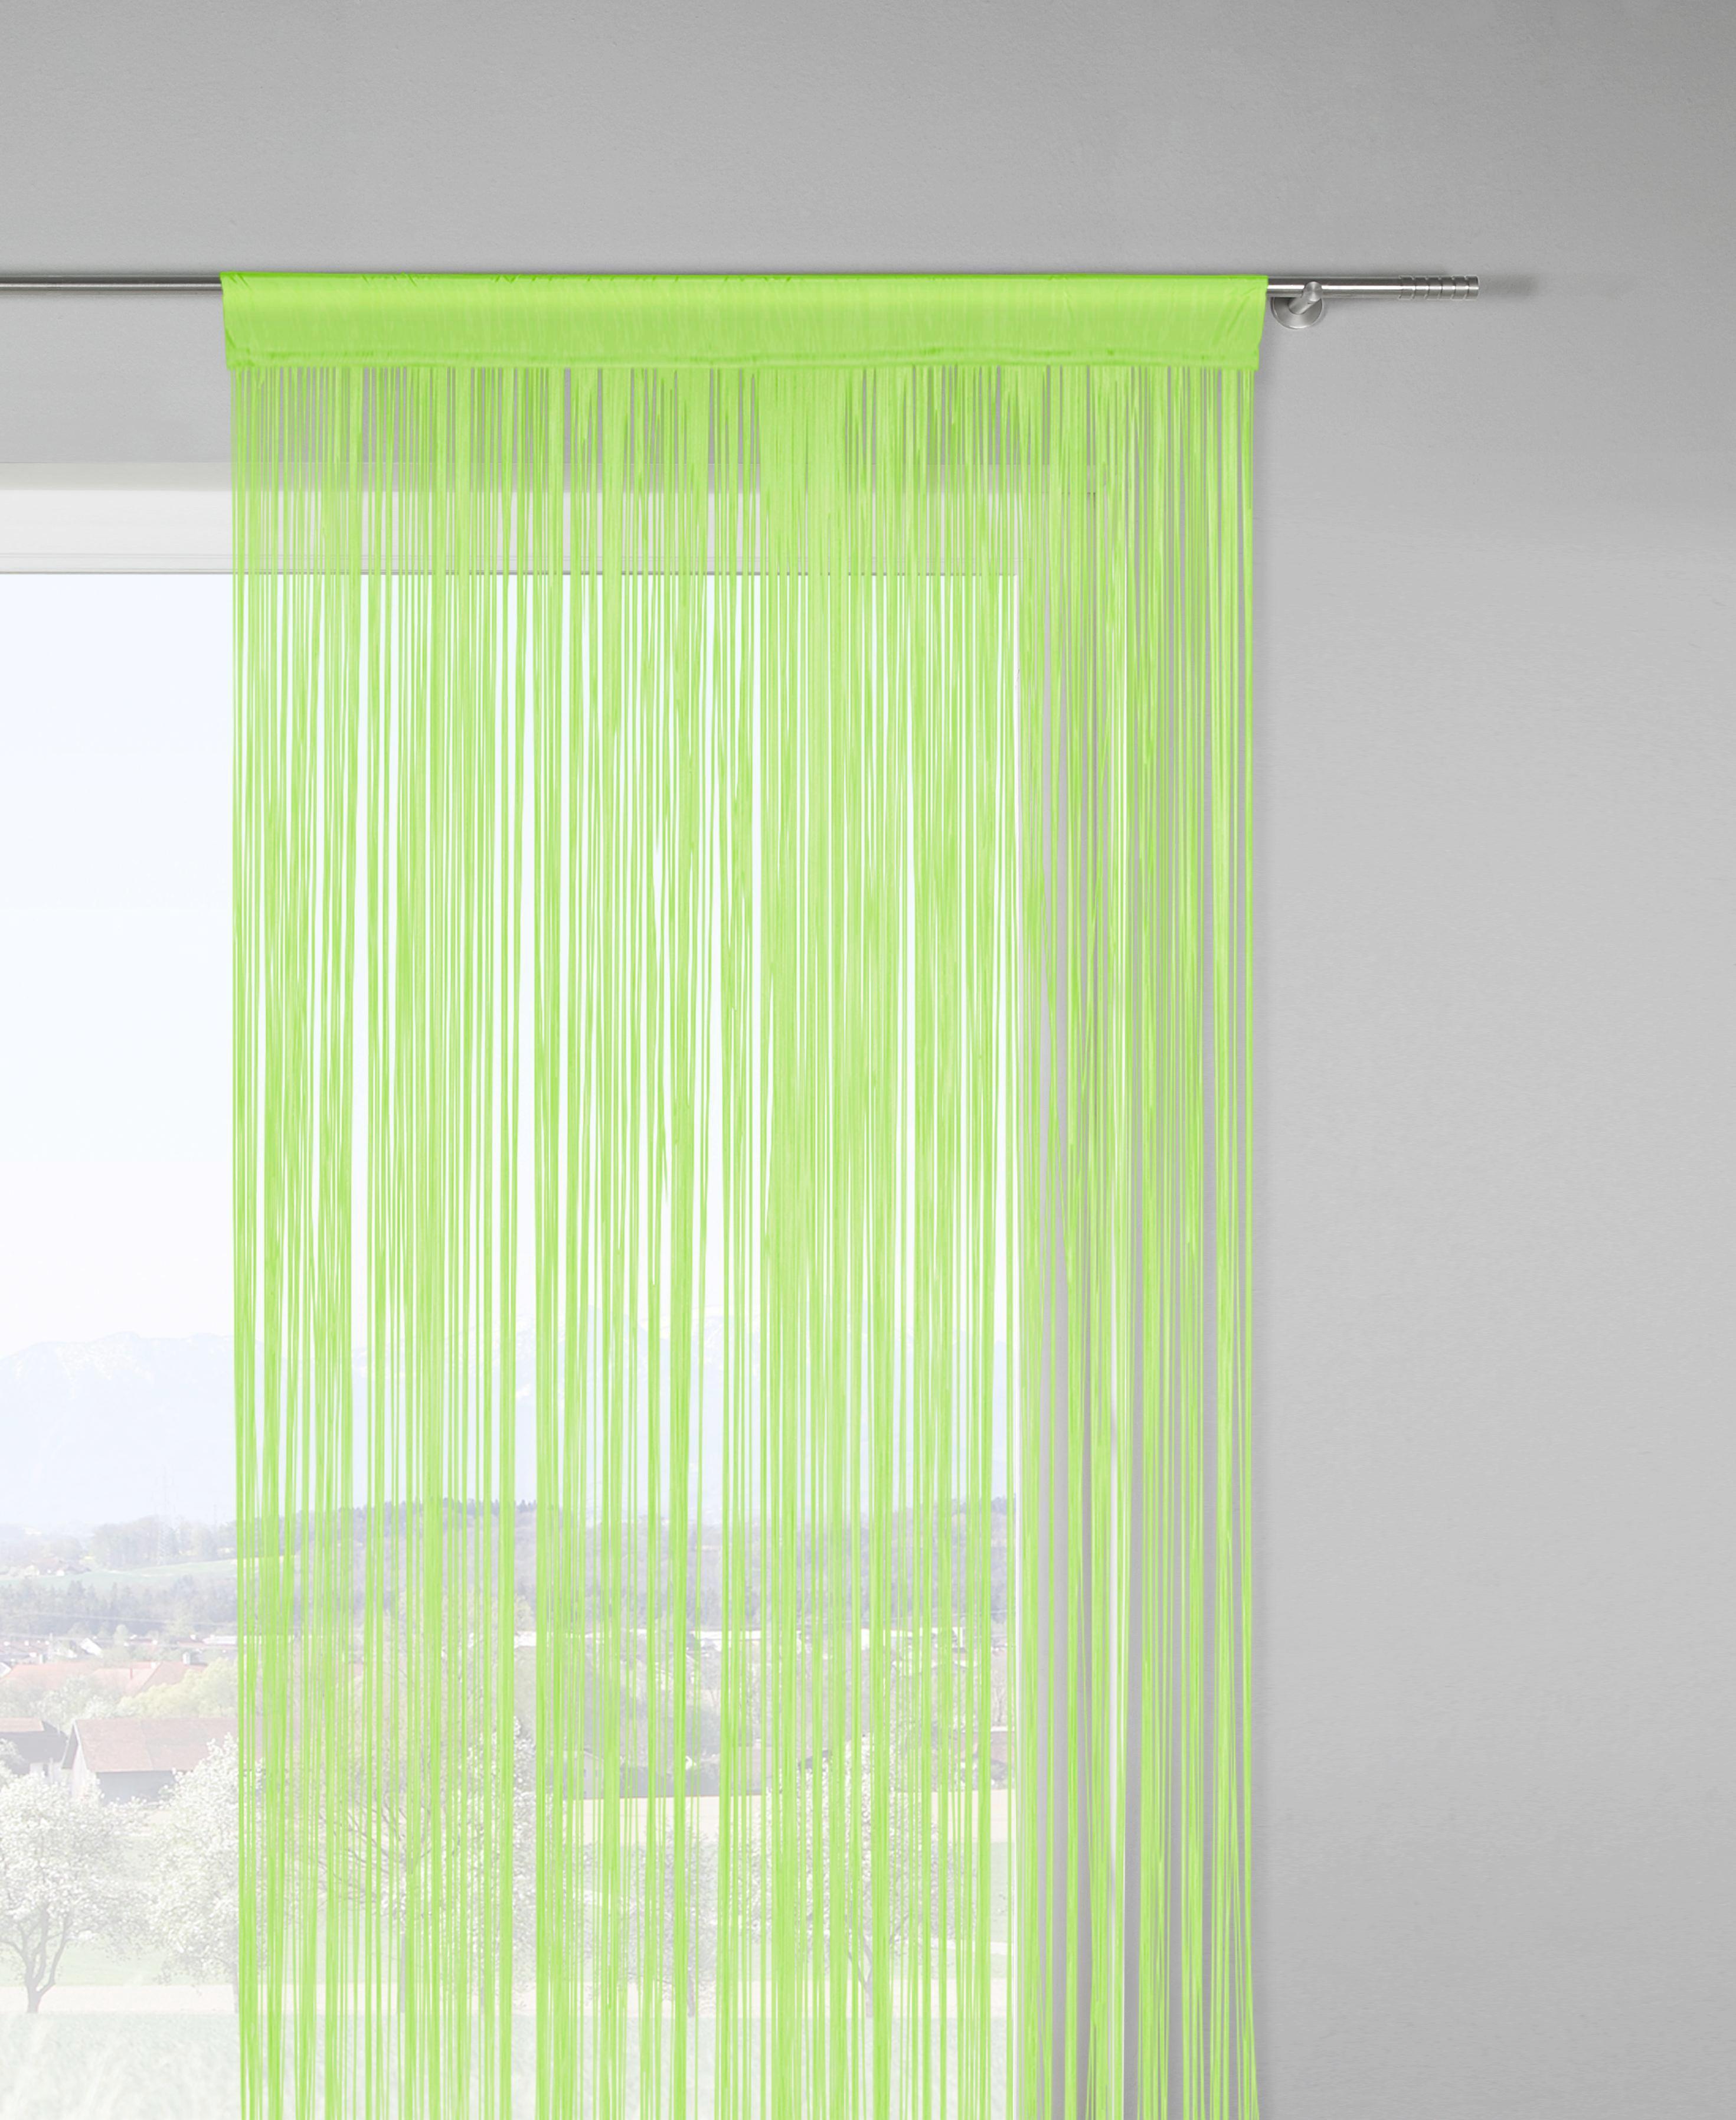 Fadenstore Victoria in Grün, ca. 90x245cm - Grün, Textil (90/245cm) - MÖMAX modern living